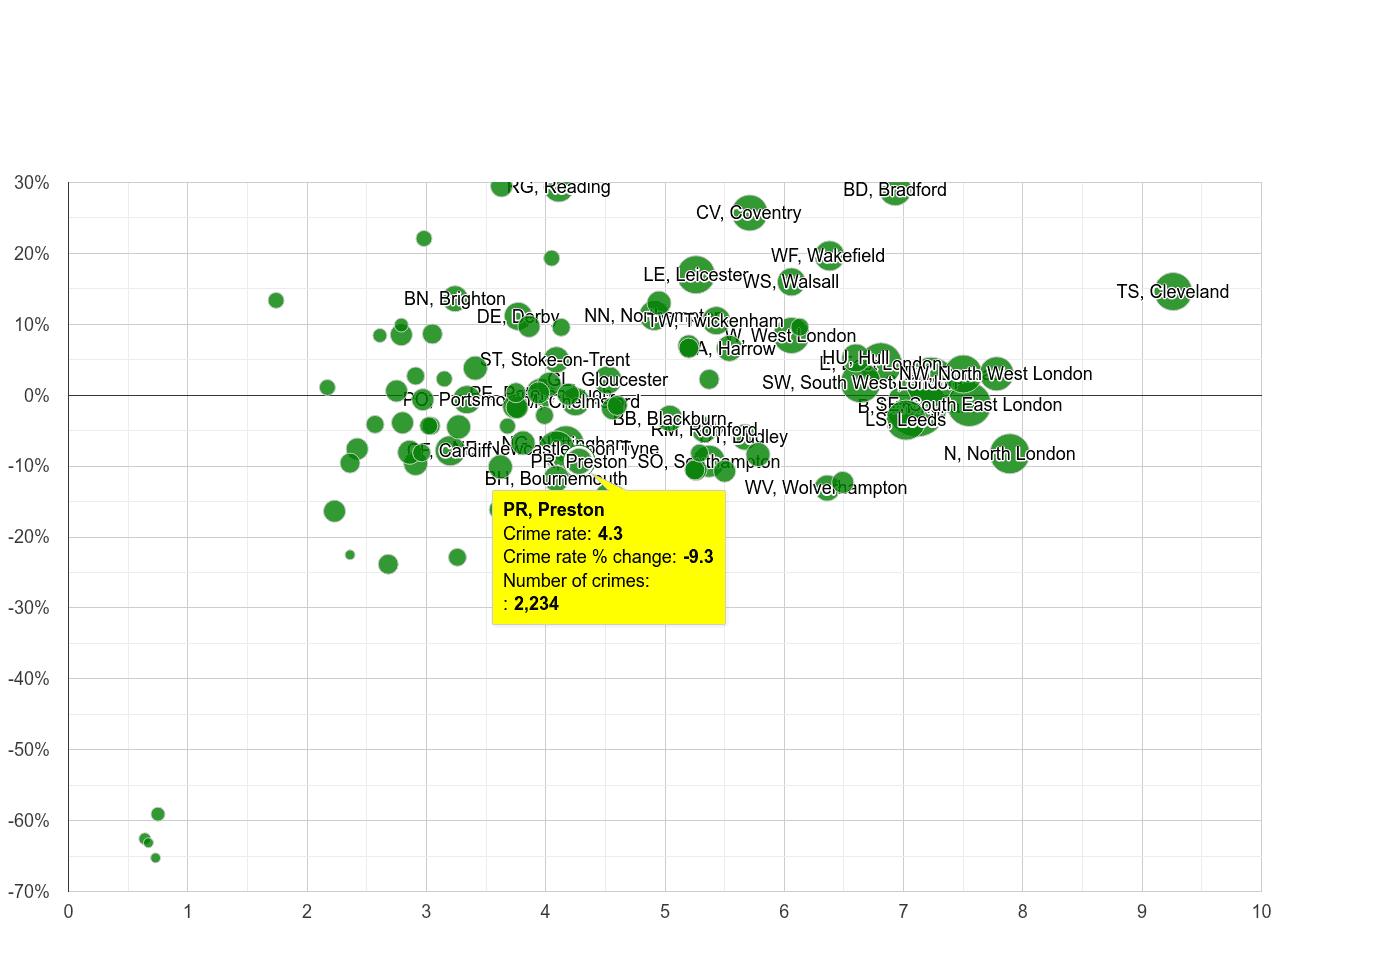 Preston burglary crime rate compared to other areas